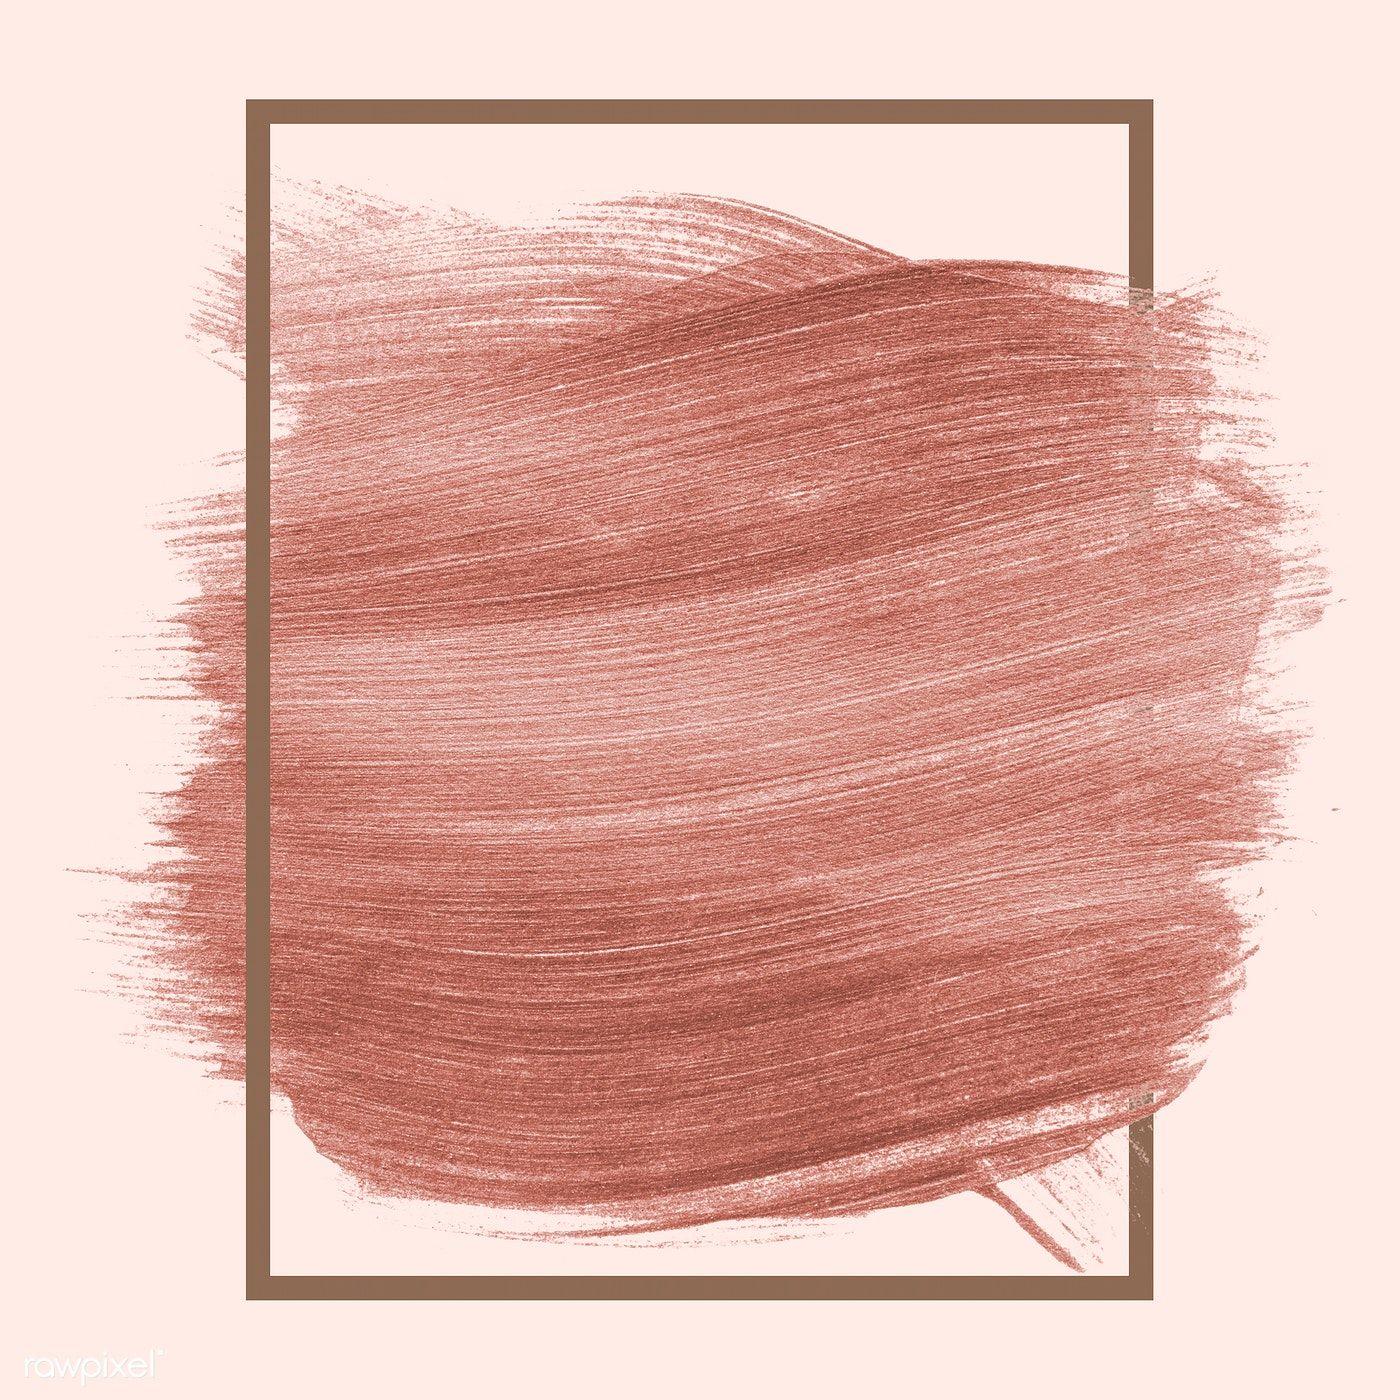 Download Premium Psd Of Pink Shimmery Brush Stroke Badge 552960 Brush Strokes Rose Gold Pink Pink Brushes